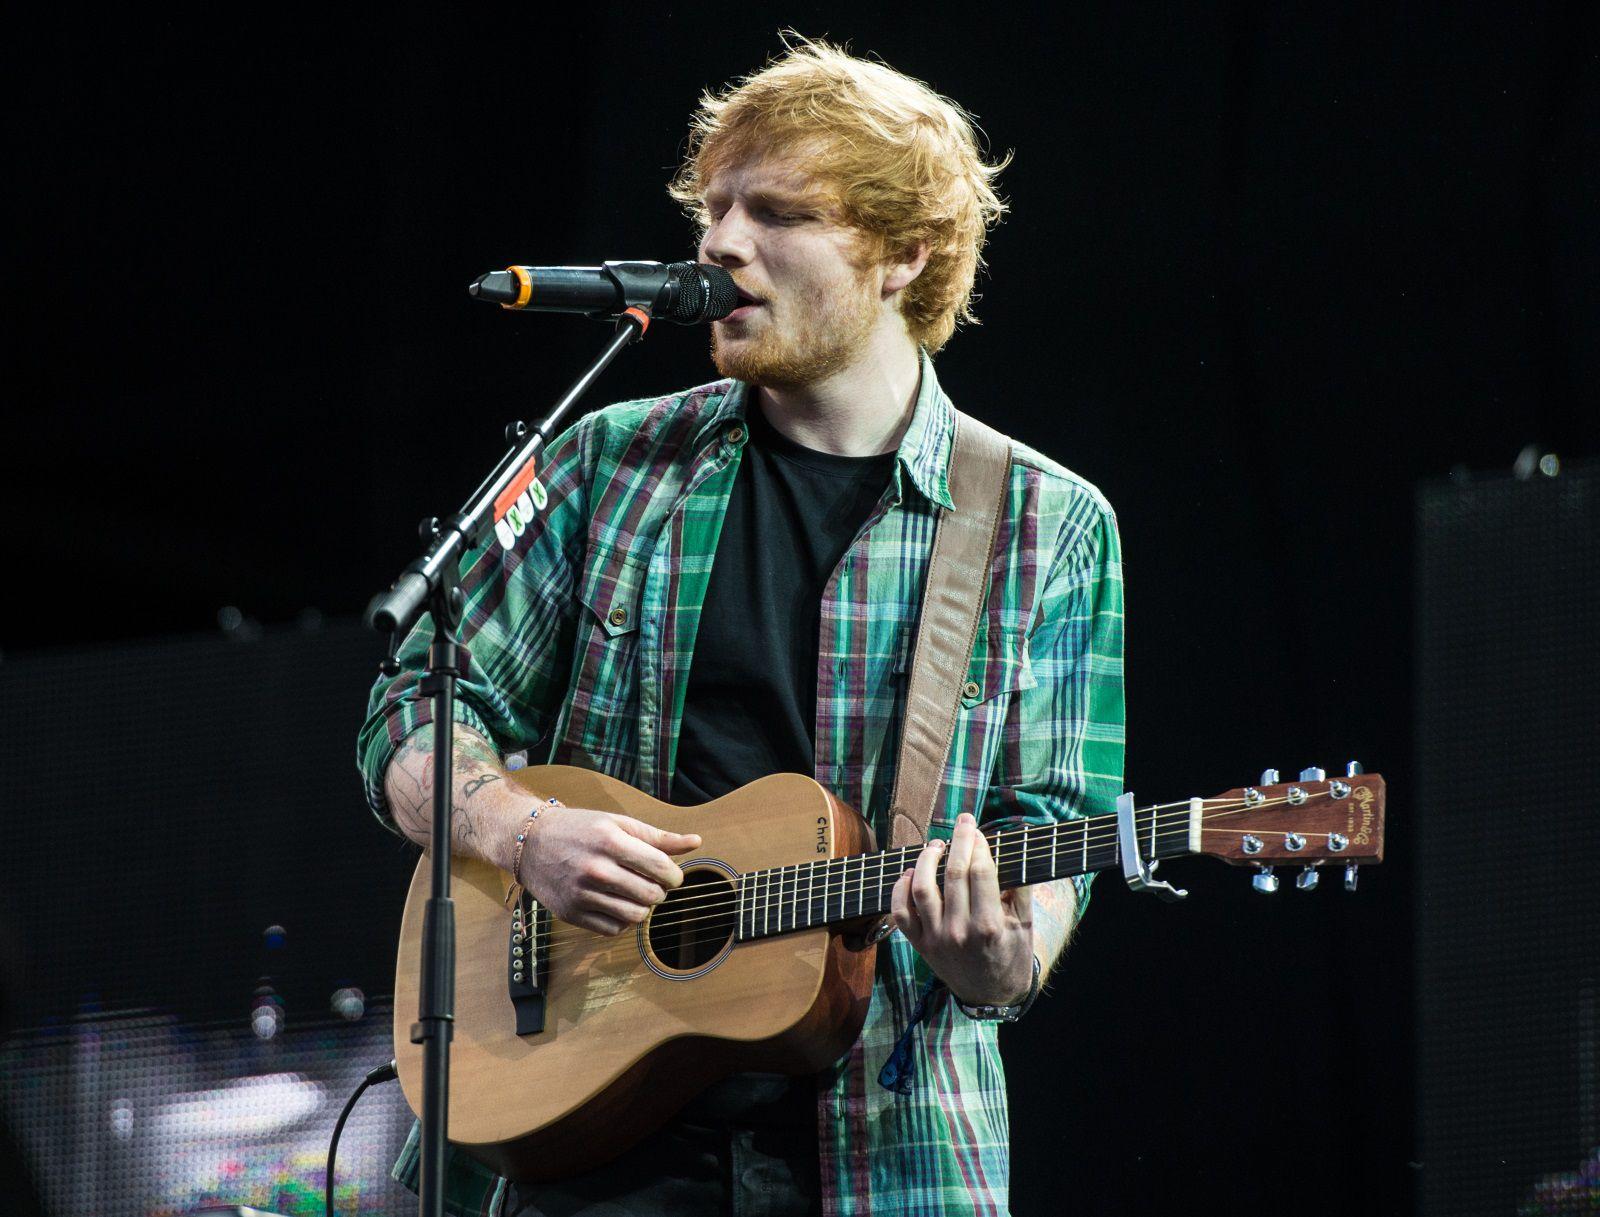 Top 10 Ed Sheeran Songs